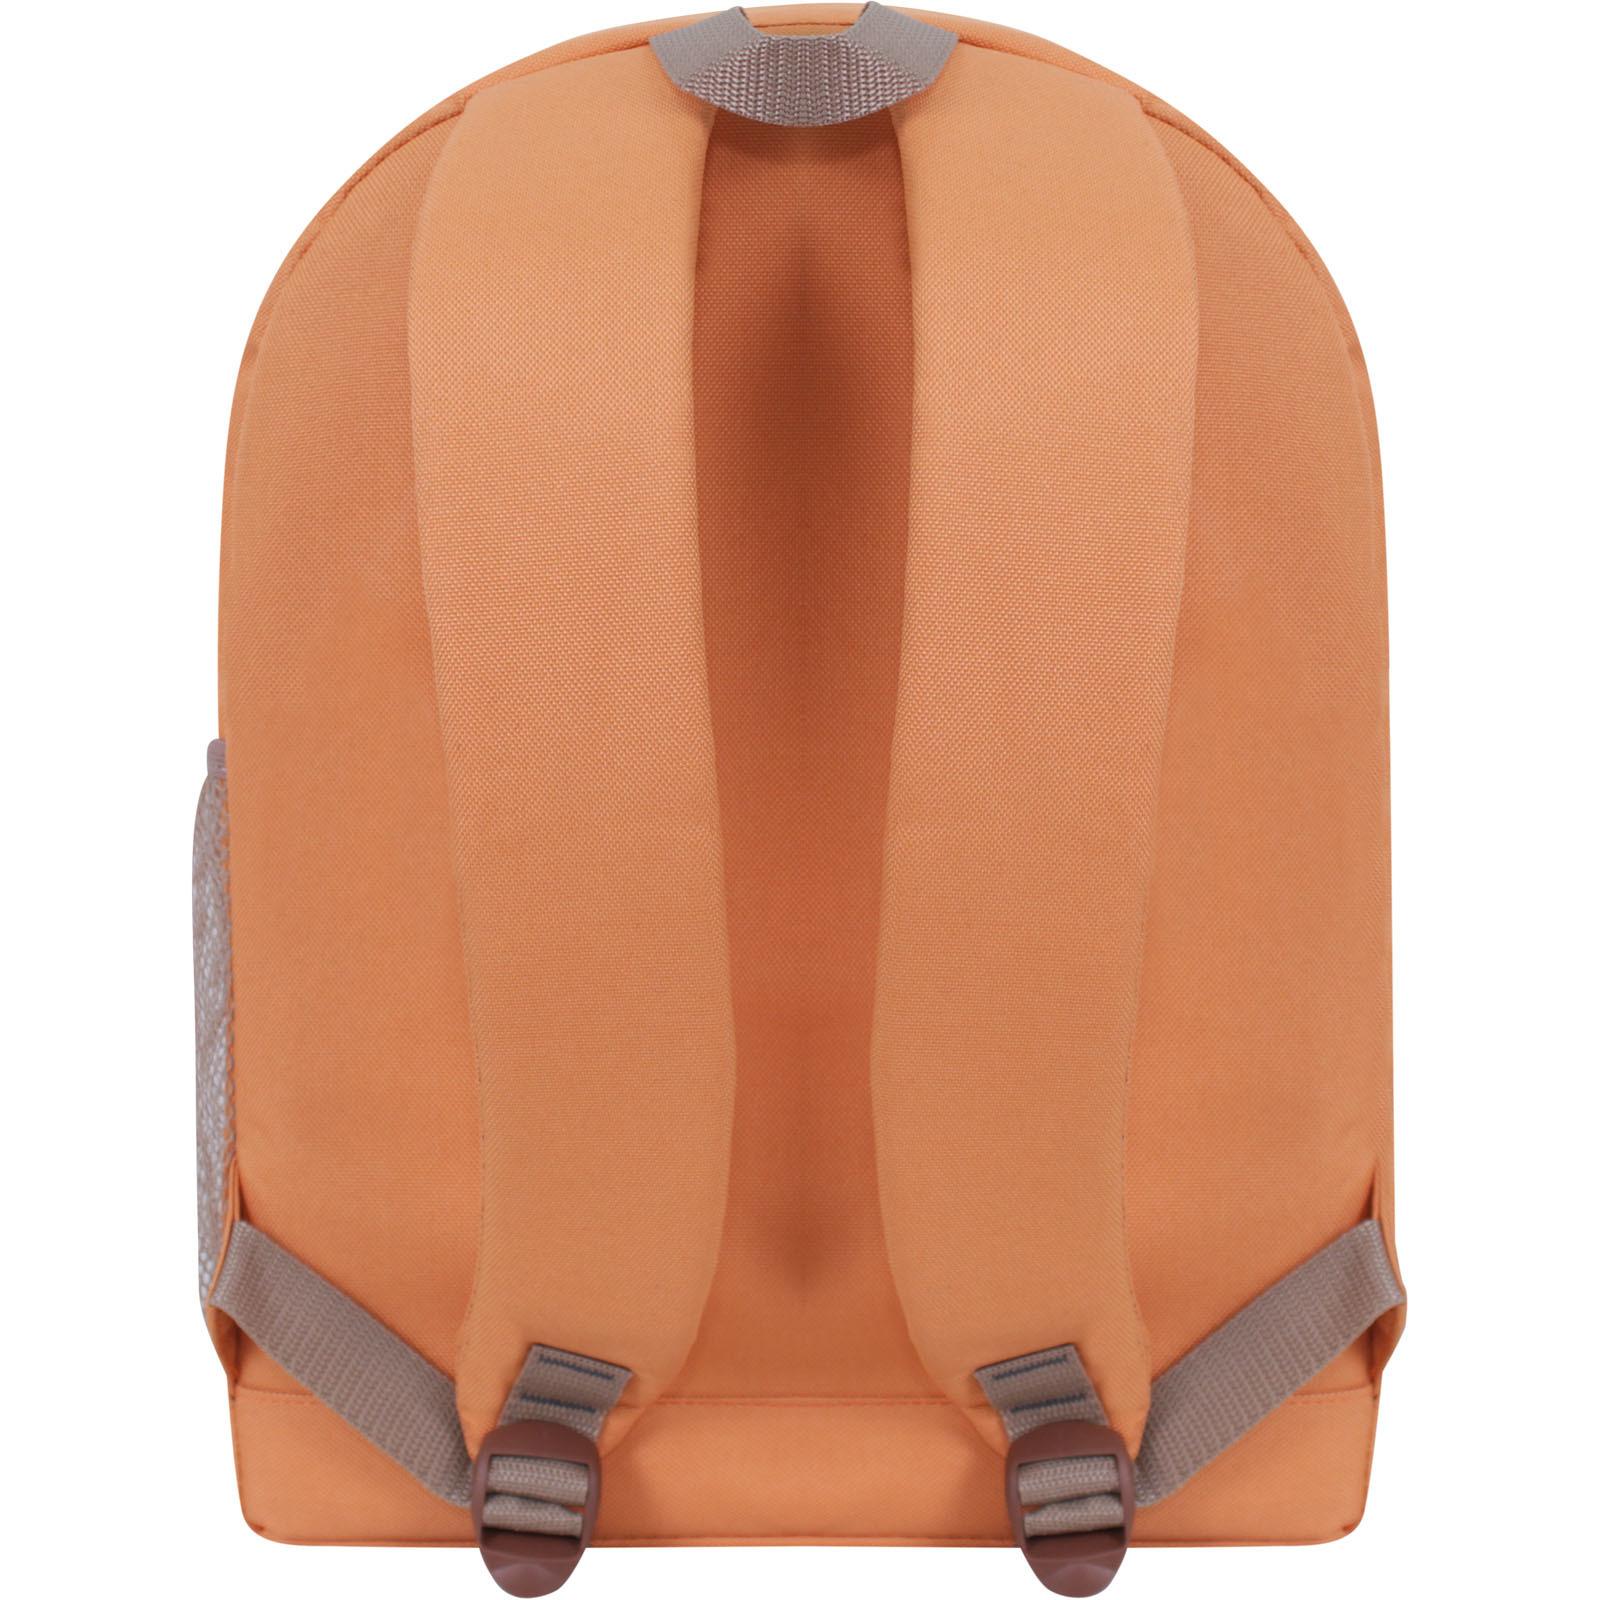 Рюкзак Bagland Молодежный W/R 17 л. Рыжий 975 (00533662)